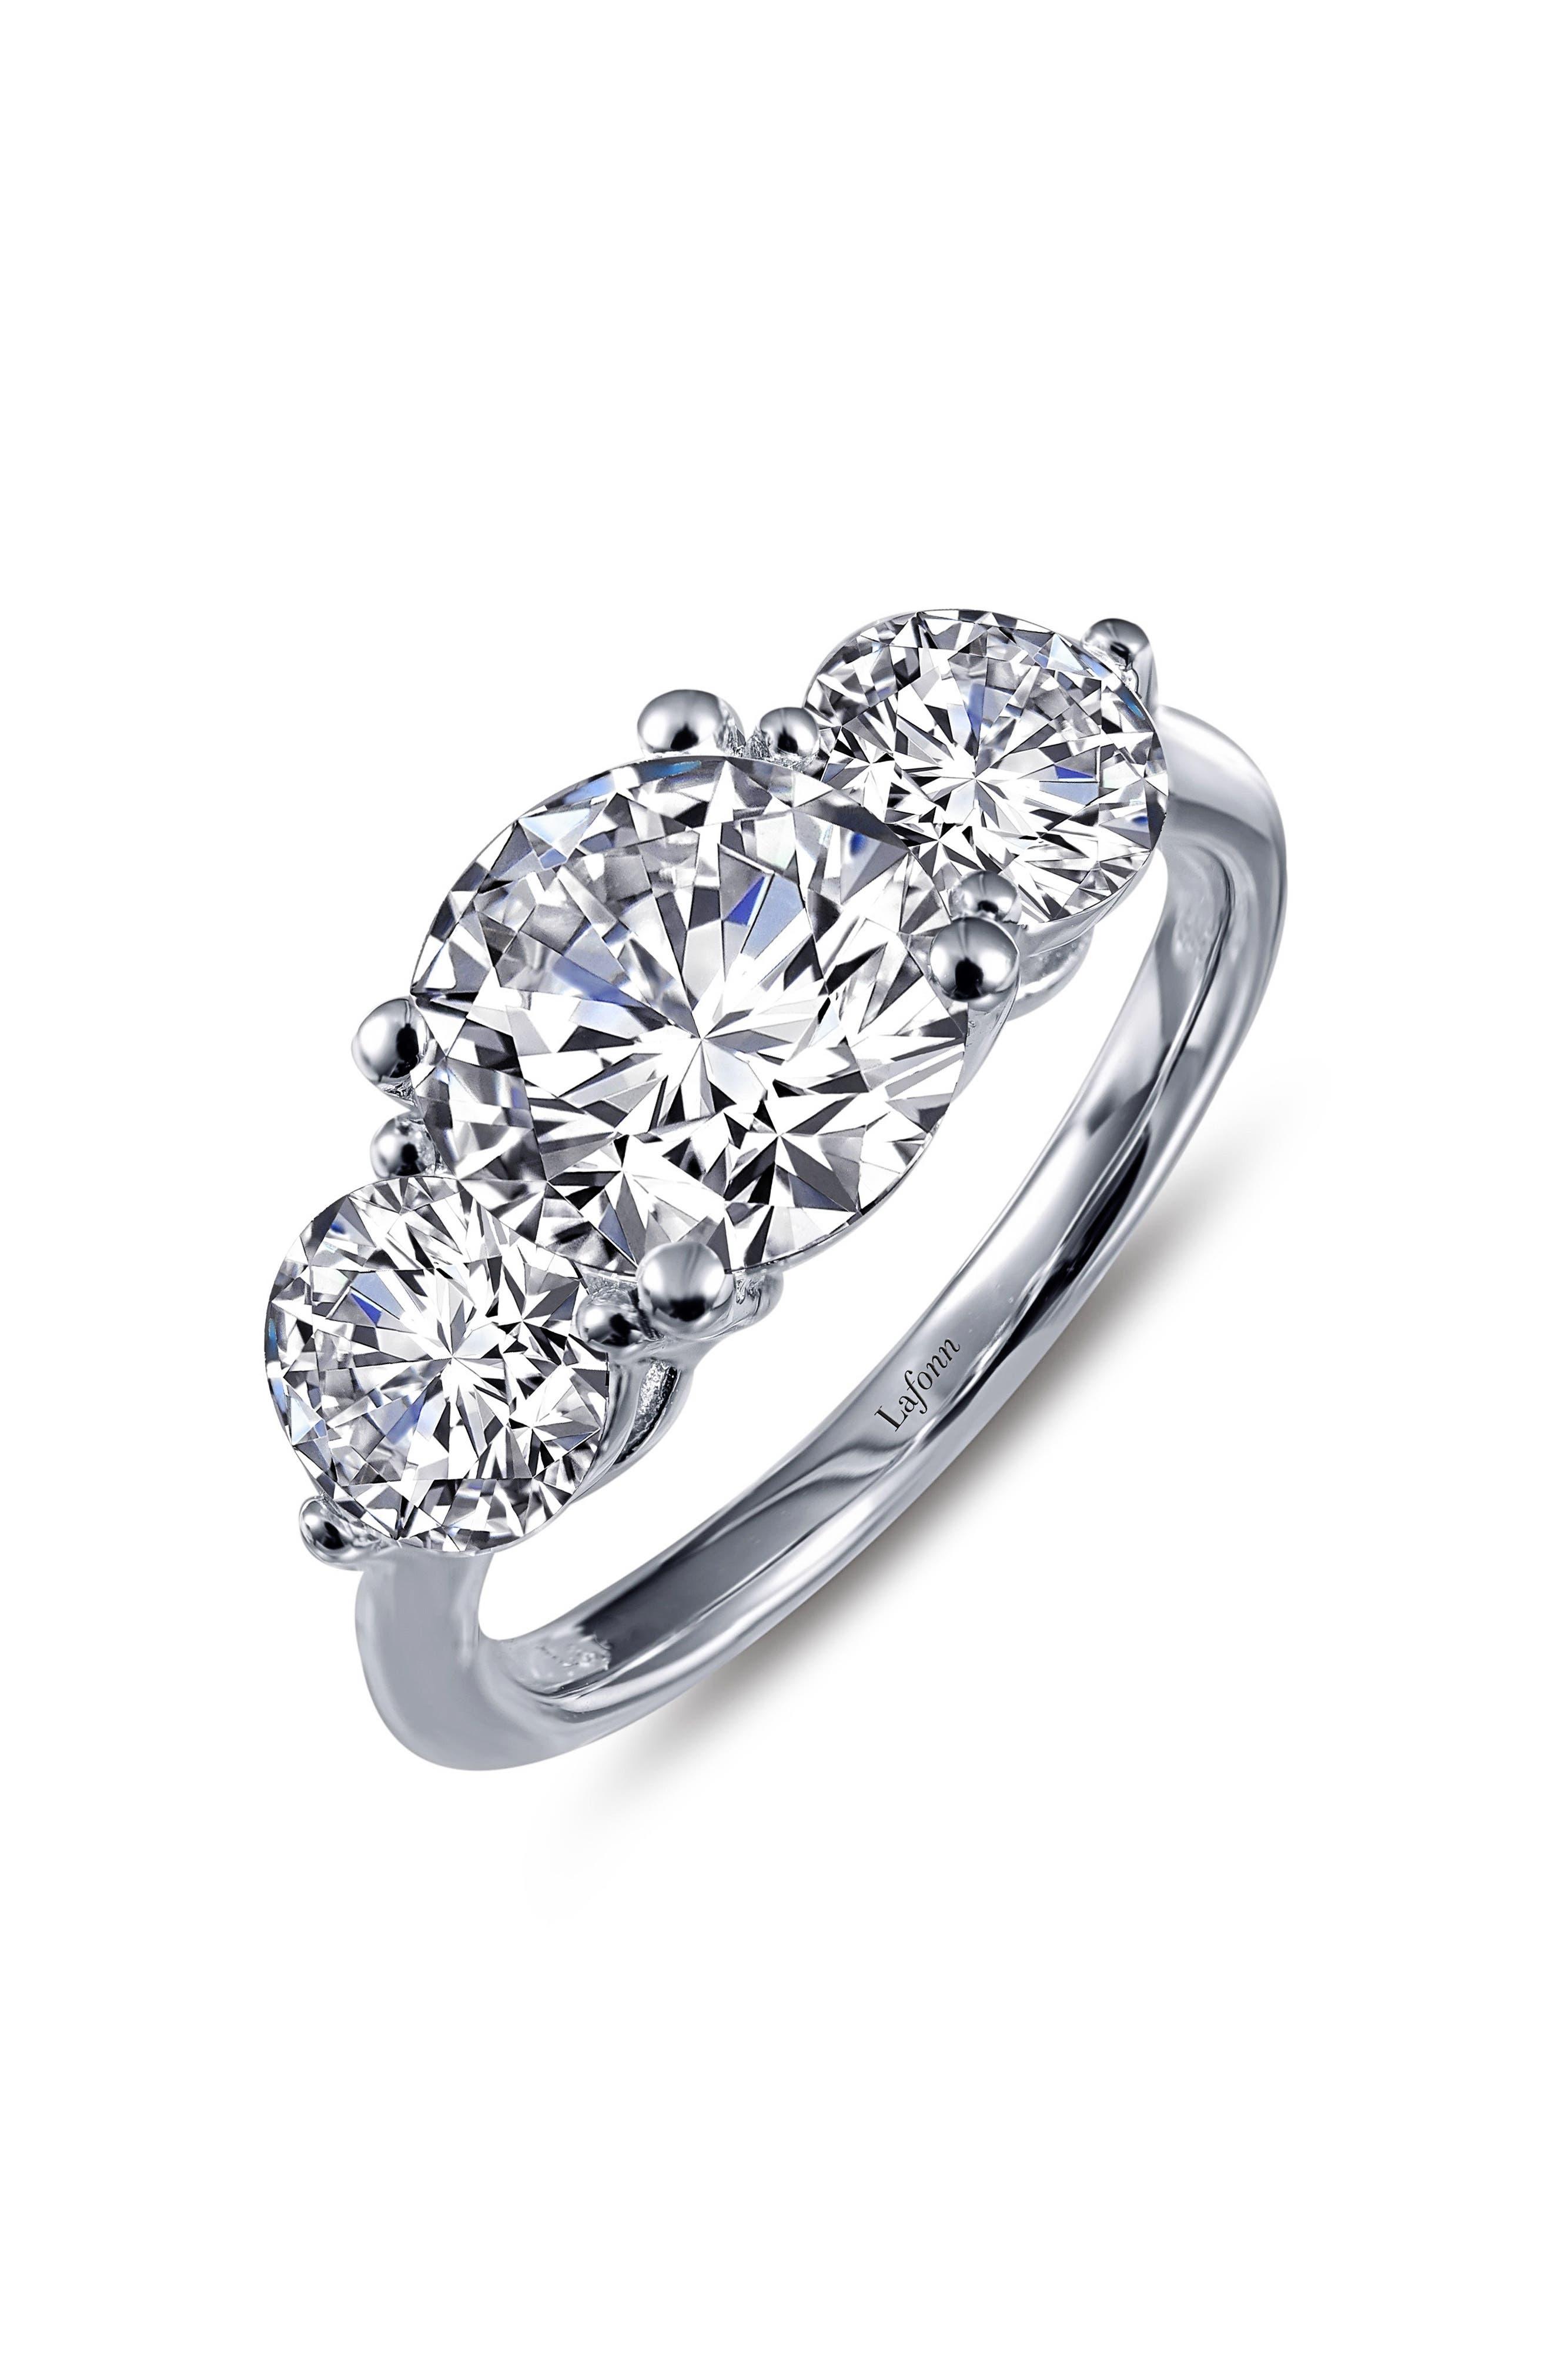 Alternate Image 1 Selected - Lafonn Simulated Diamond Ring